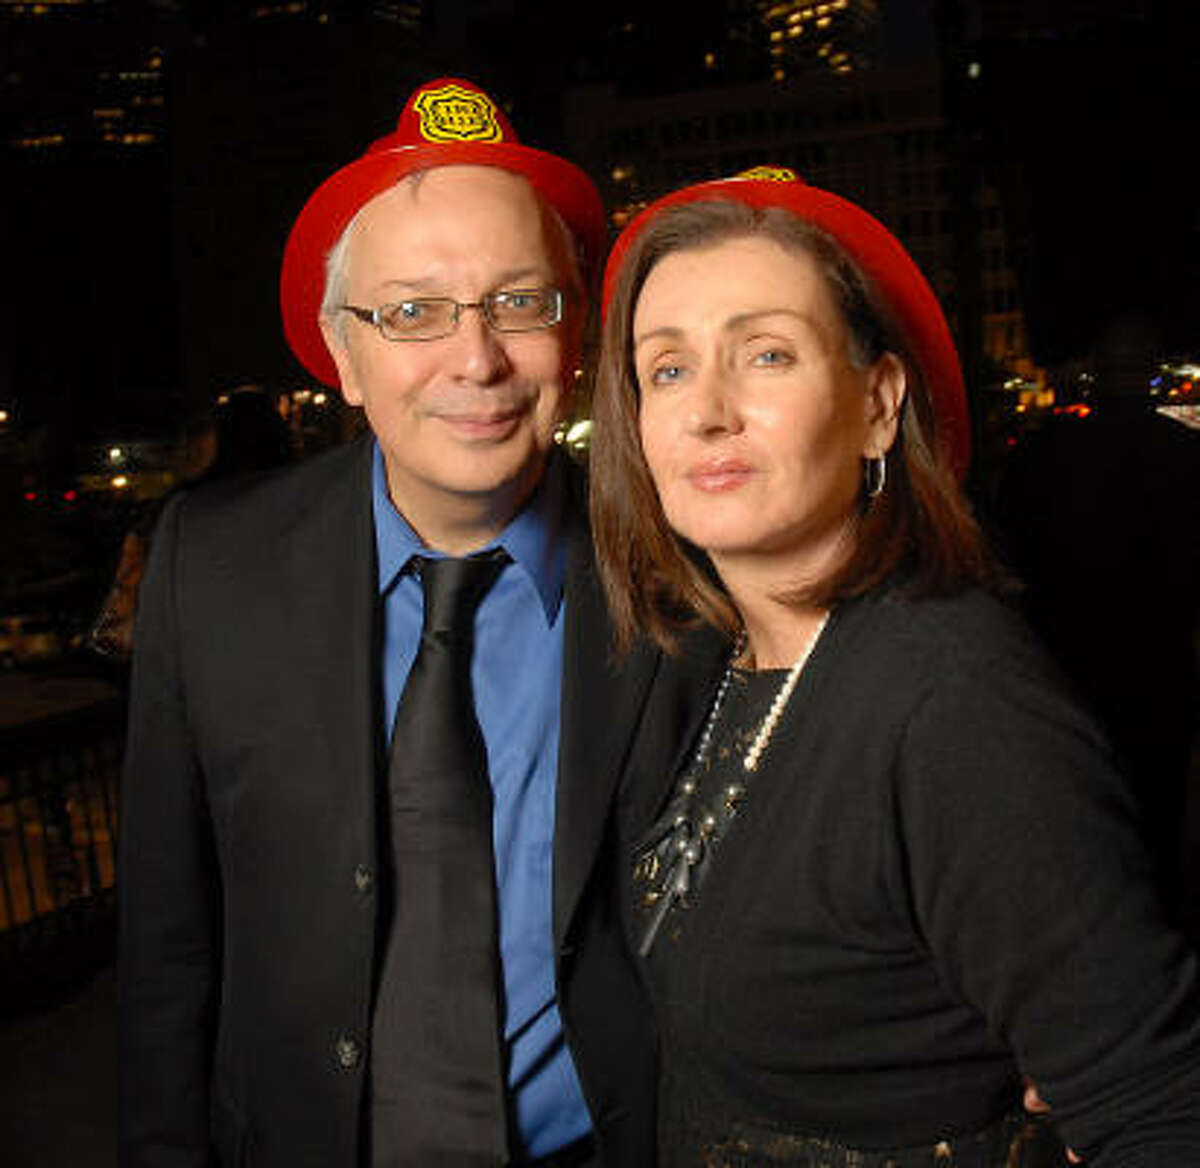 Don and Linda Darke